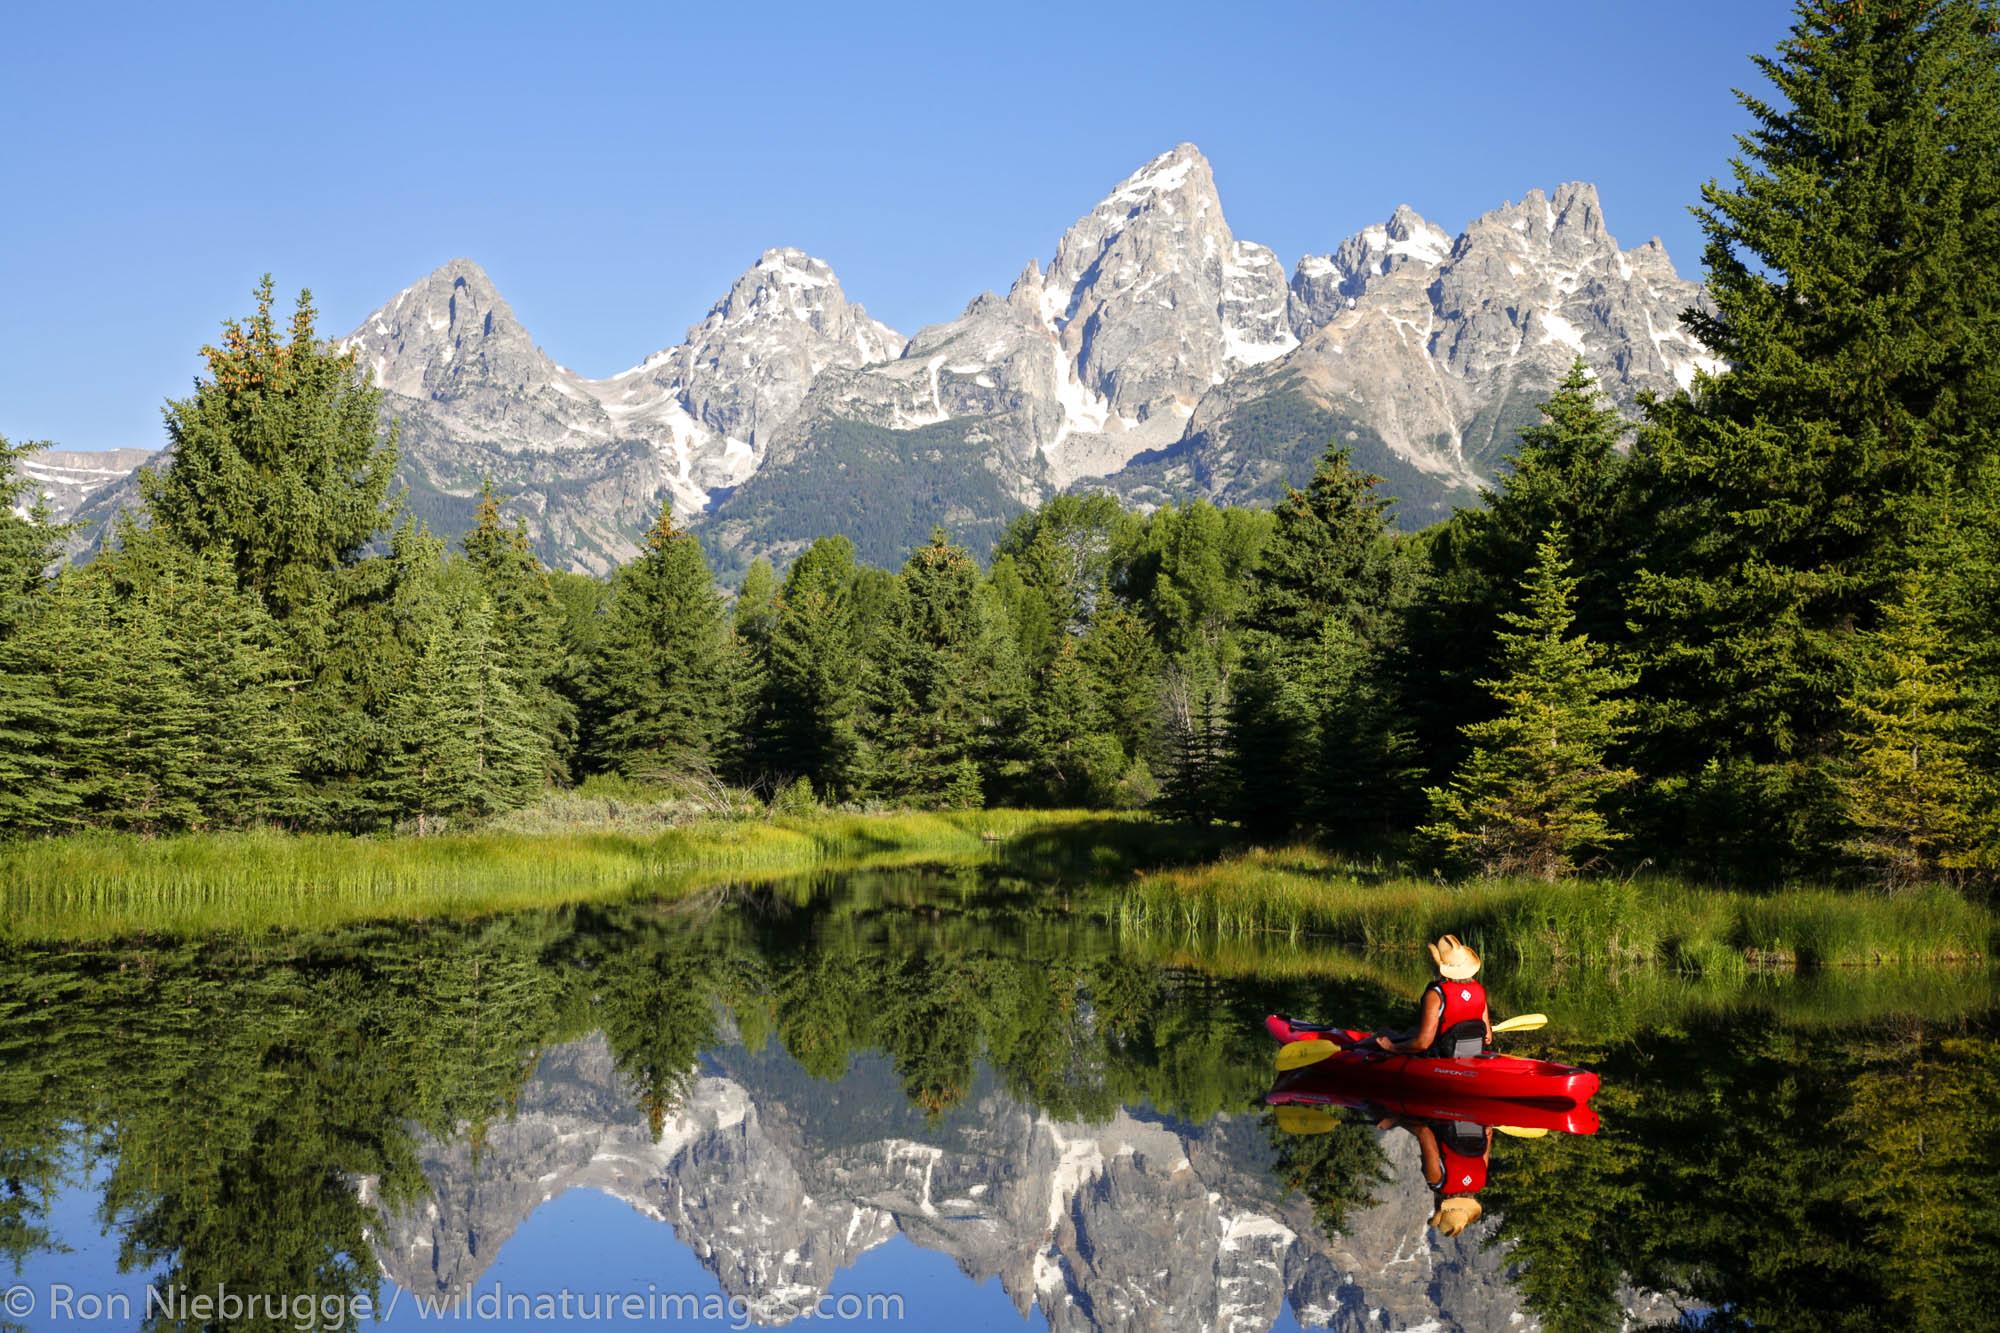 Kayaking in Grand Teton National Park, Wyoming.  (model released)